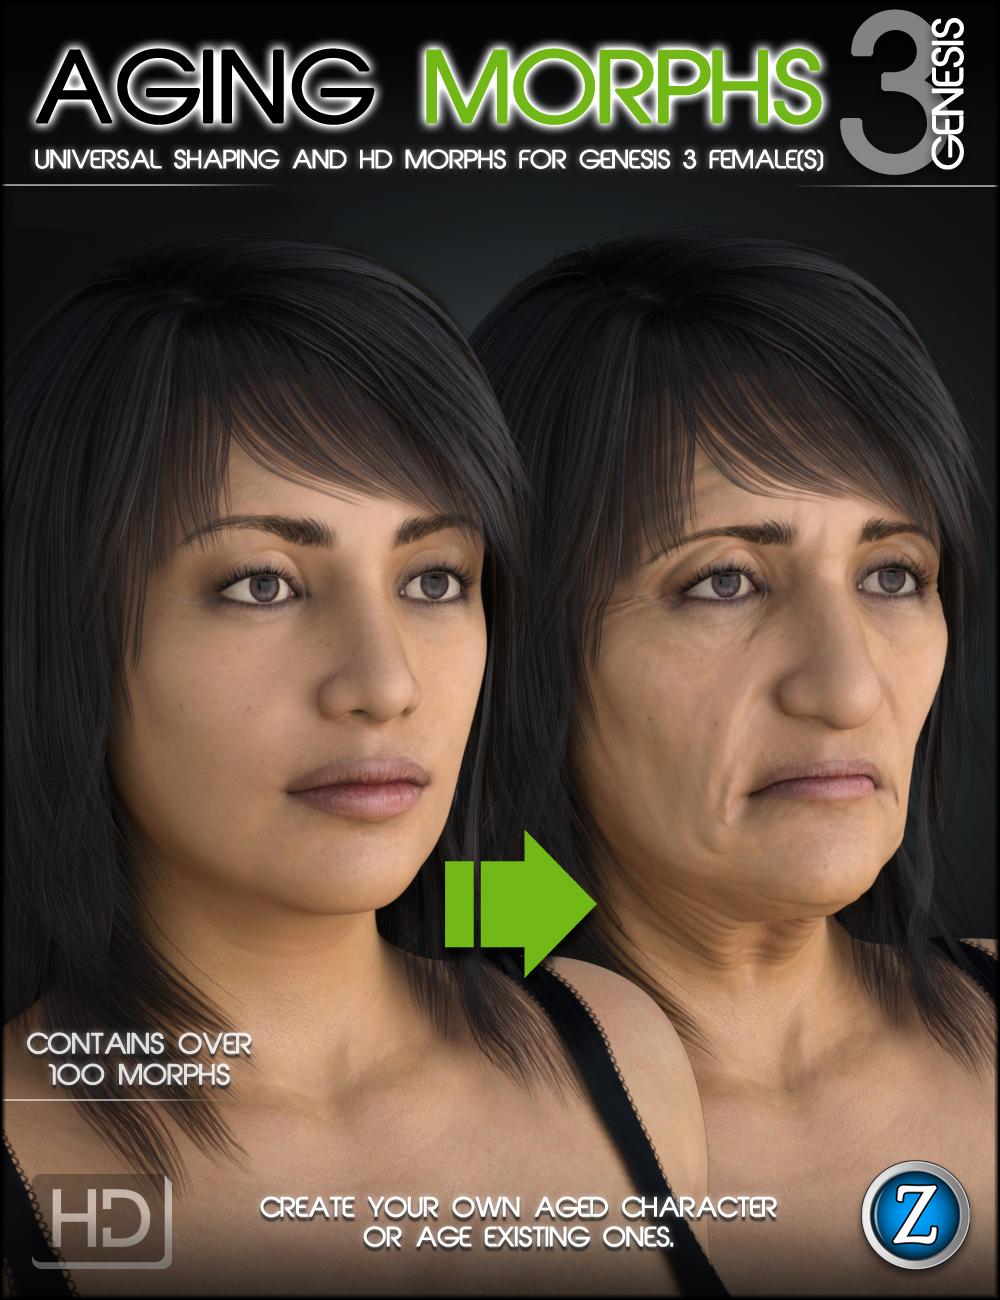 Aging Morphs 3 for Genesis 3 Female(s) by: Zev0, 3D Models by Daz 3D